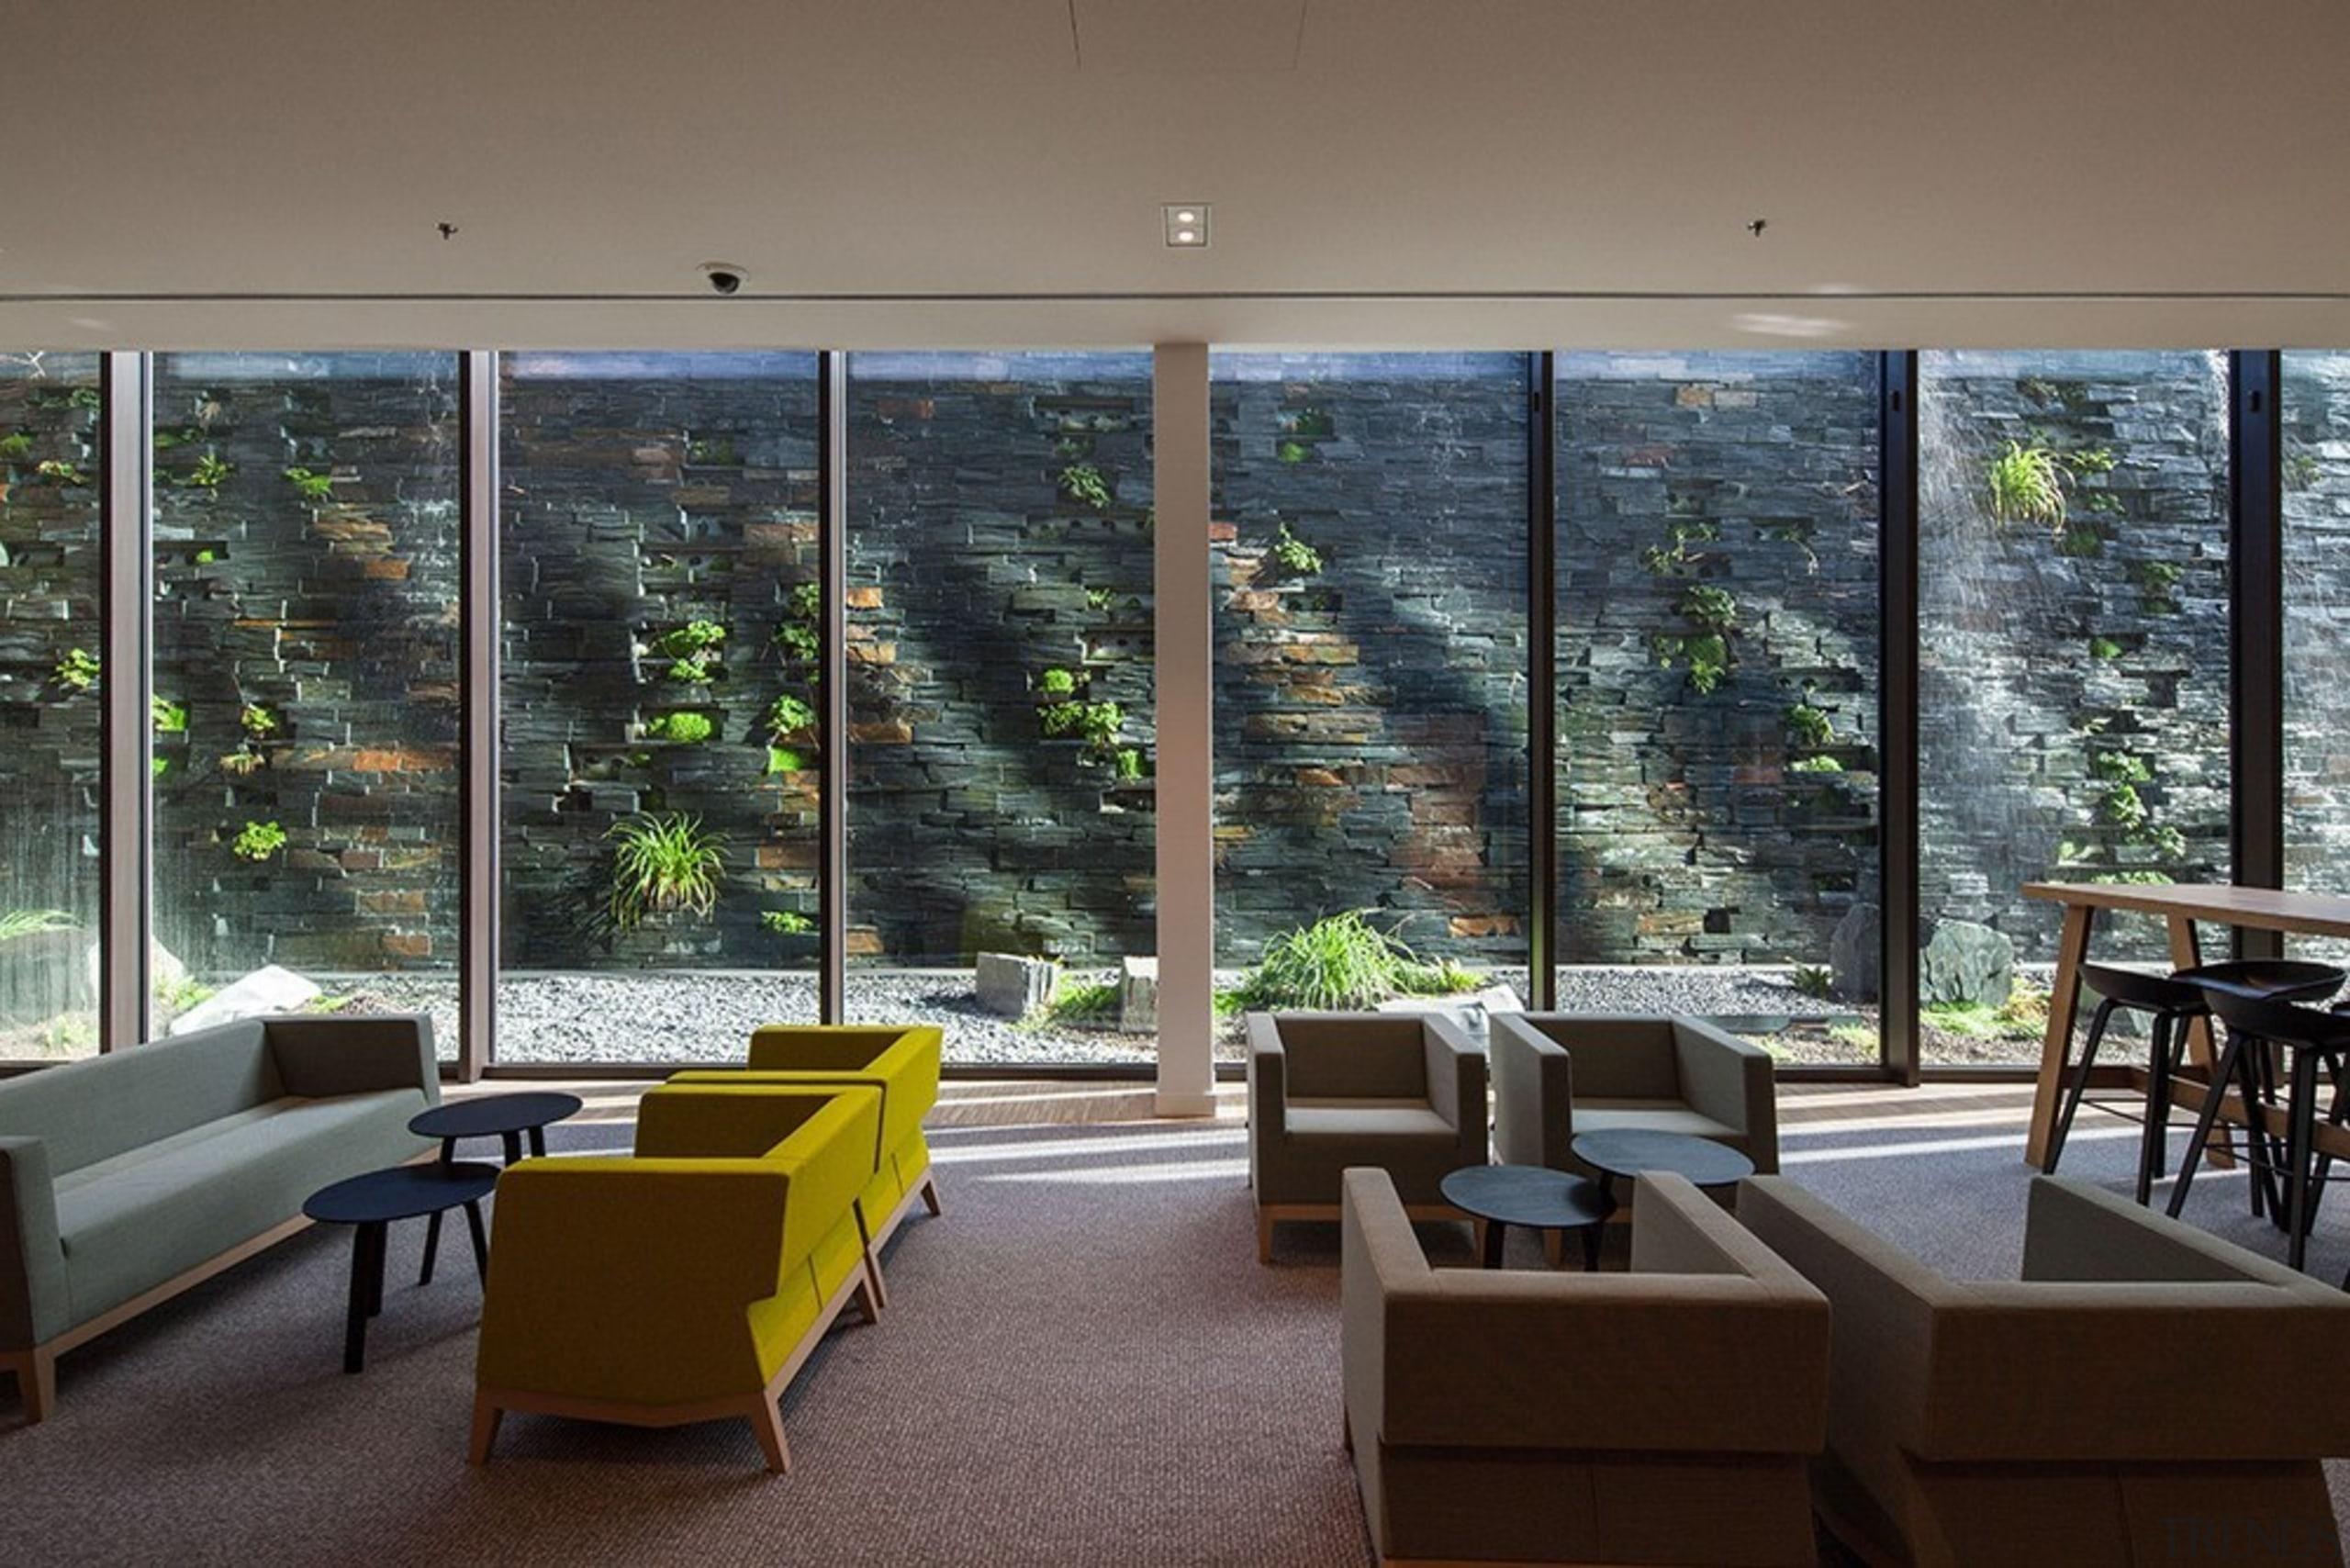 Eurojust - architecture | daylighting | house | architecture, daylighting, house, interior design, real estate, window, gray, black